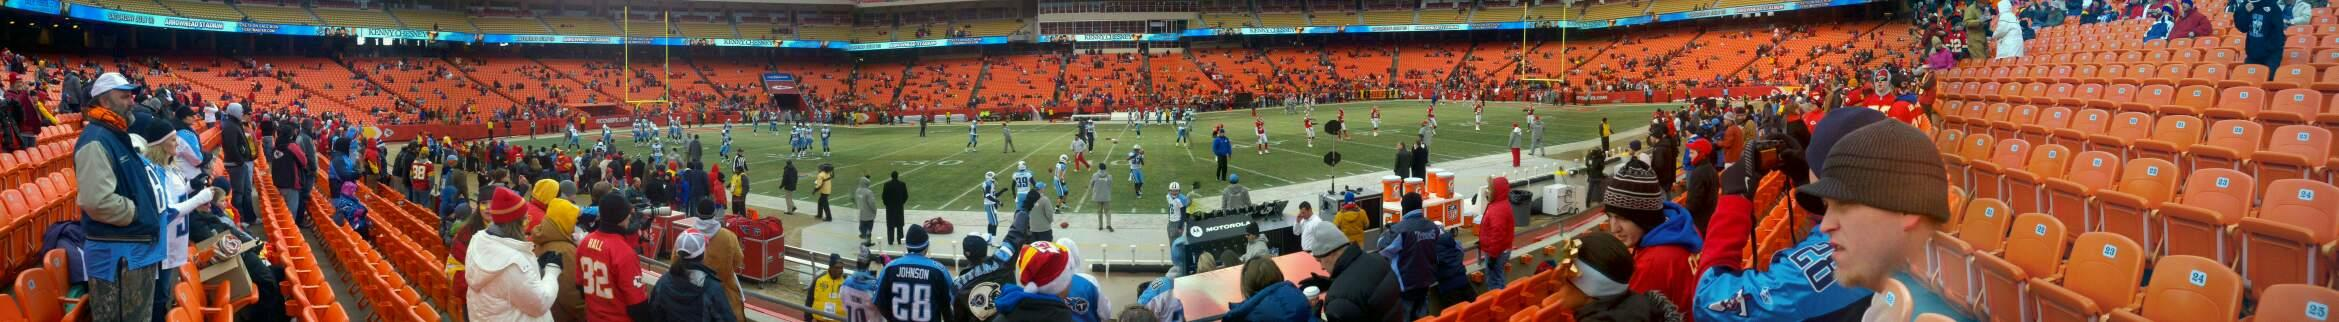 Arrowhead Stadium Section 101 Row 6 Seat 23